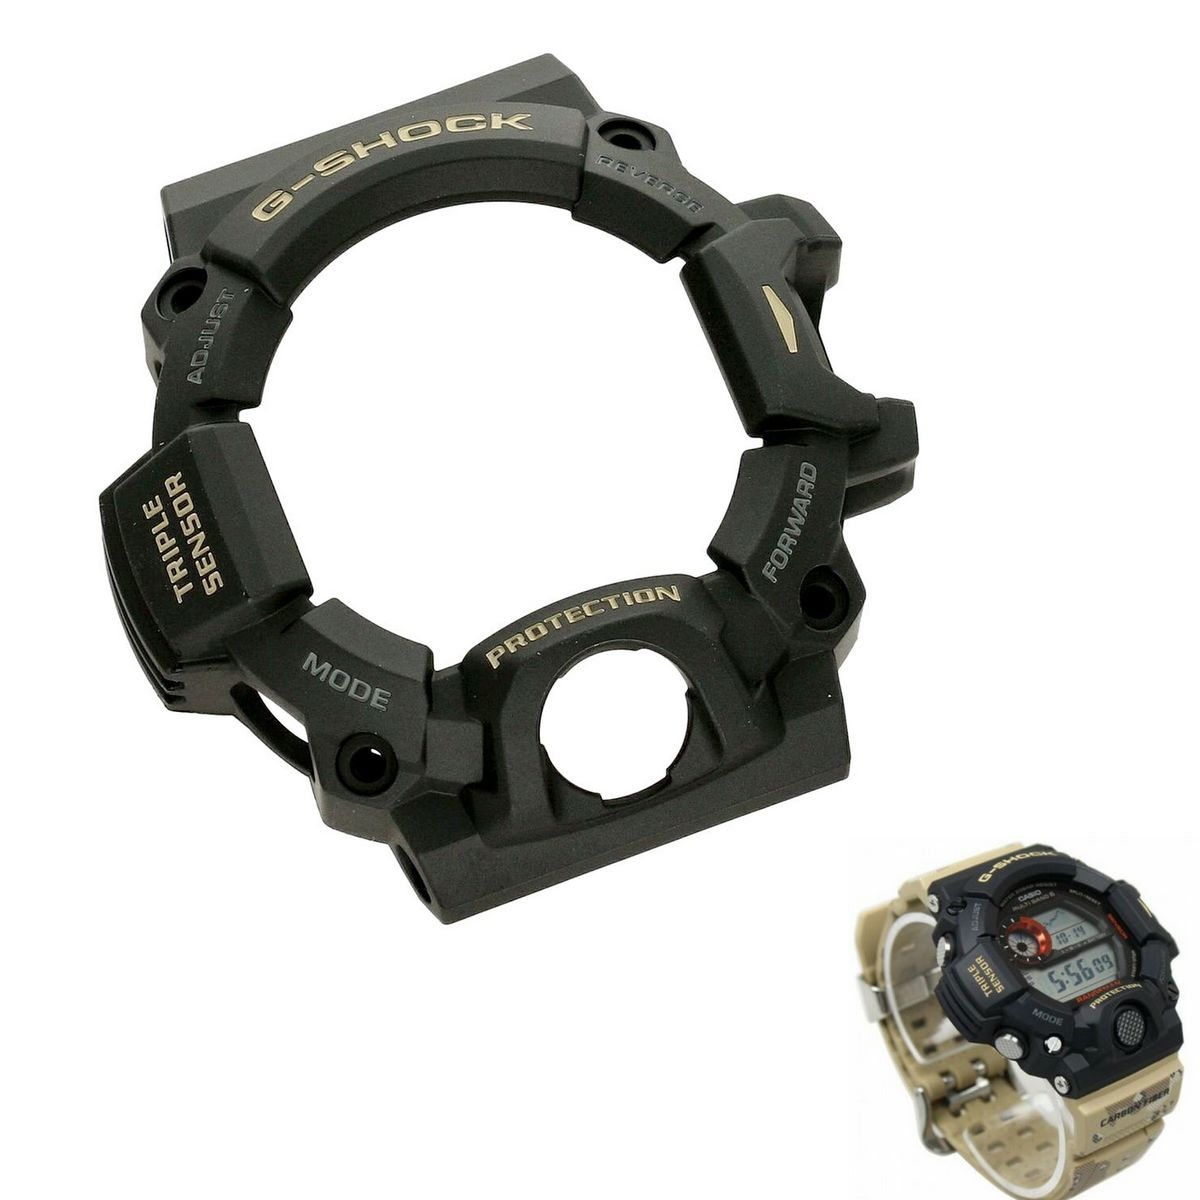 Bezel Capa Casio G-Shock Rangeman GW-9400DCJ-1 preto  *  - E-Presentes